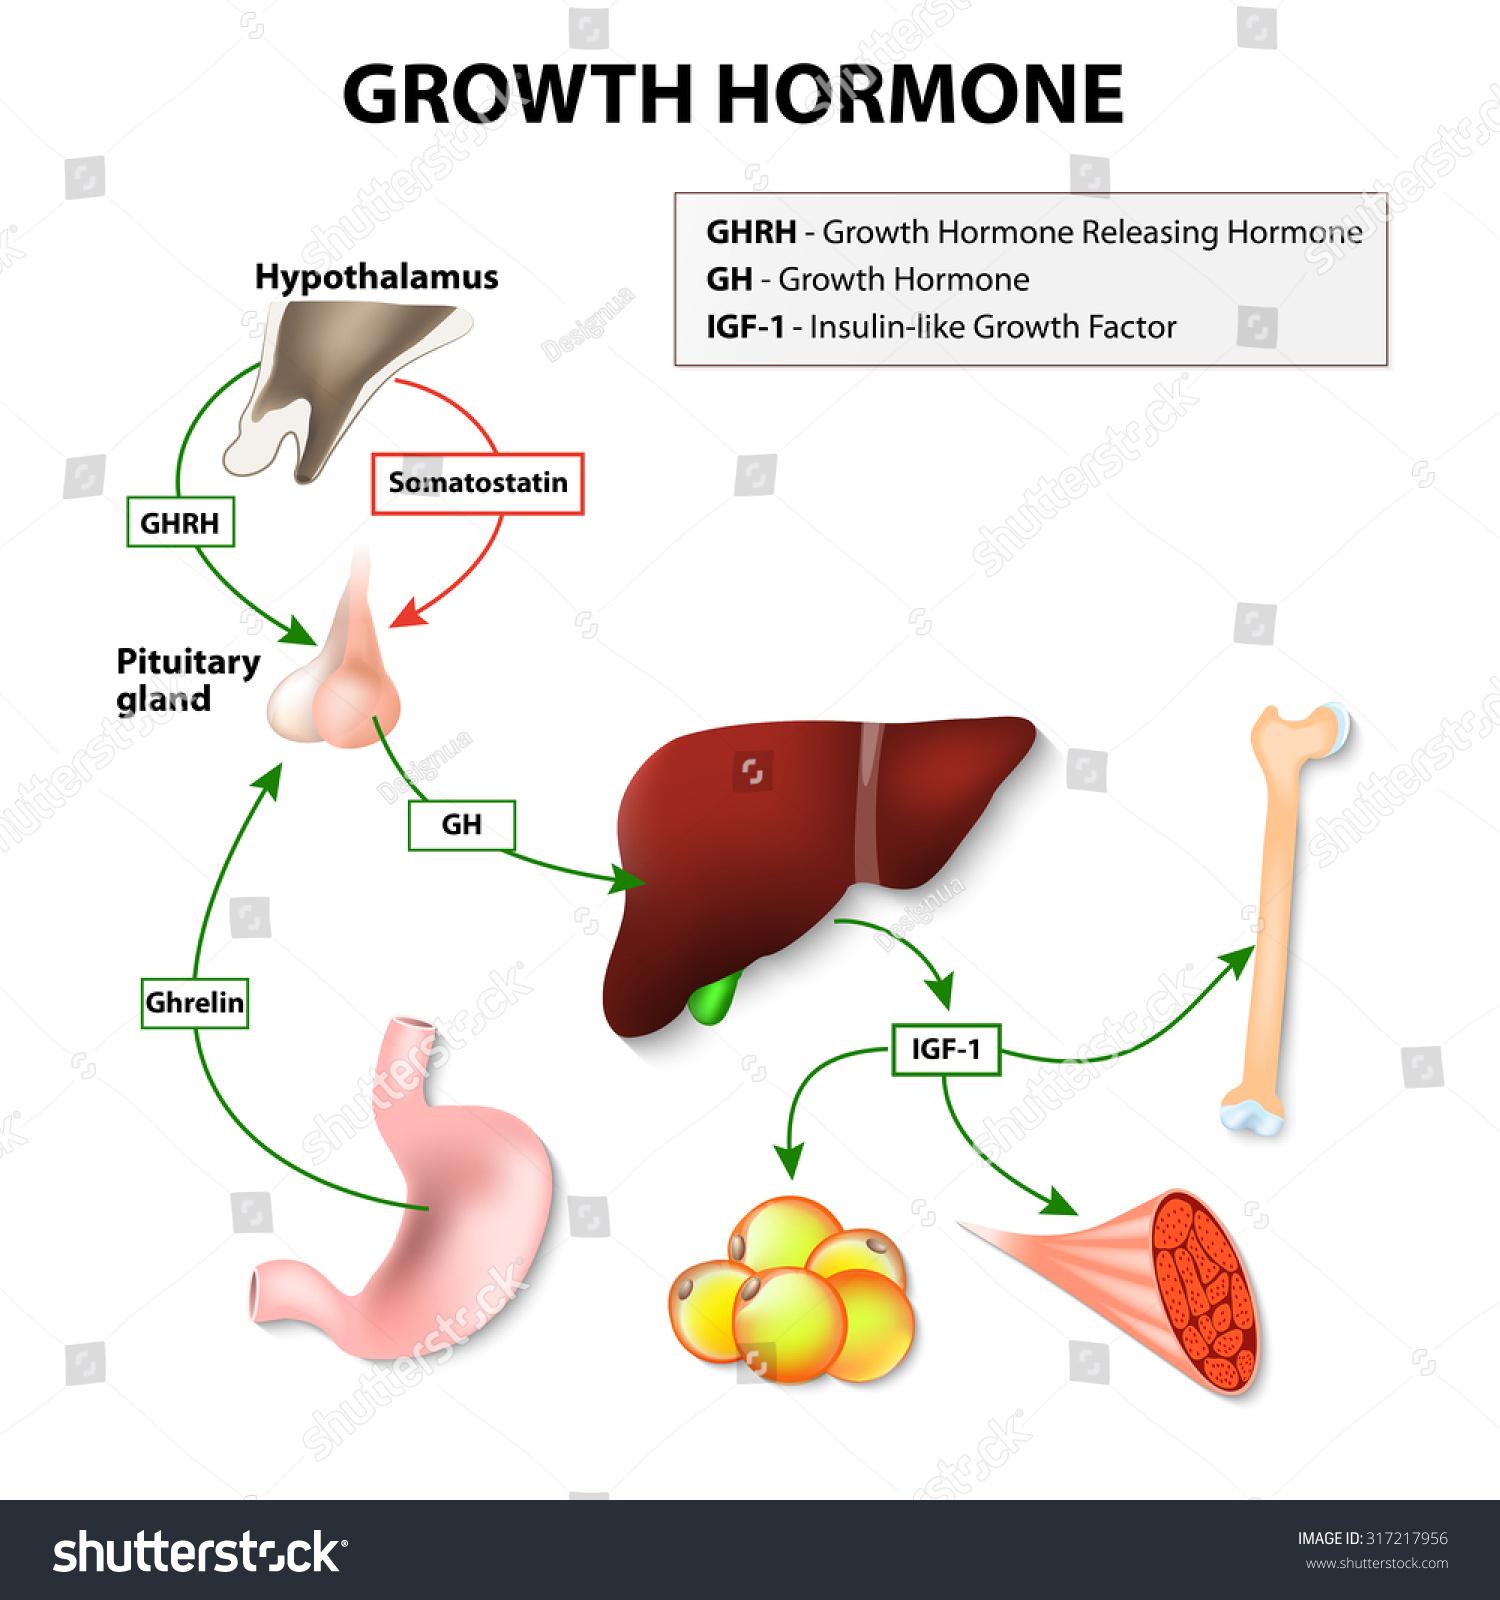 Royalty Free Stock Illustration Of Growth Hormonereleasing Hormone